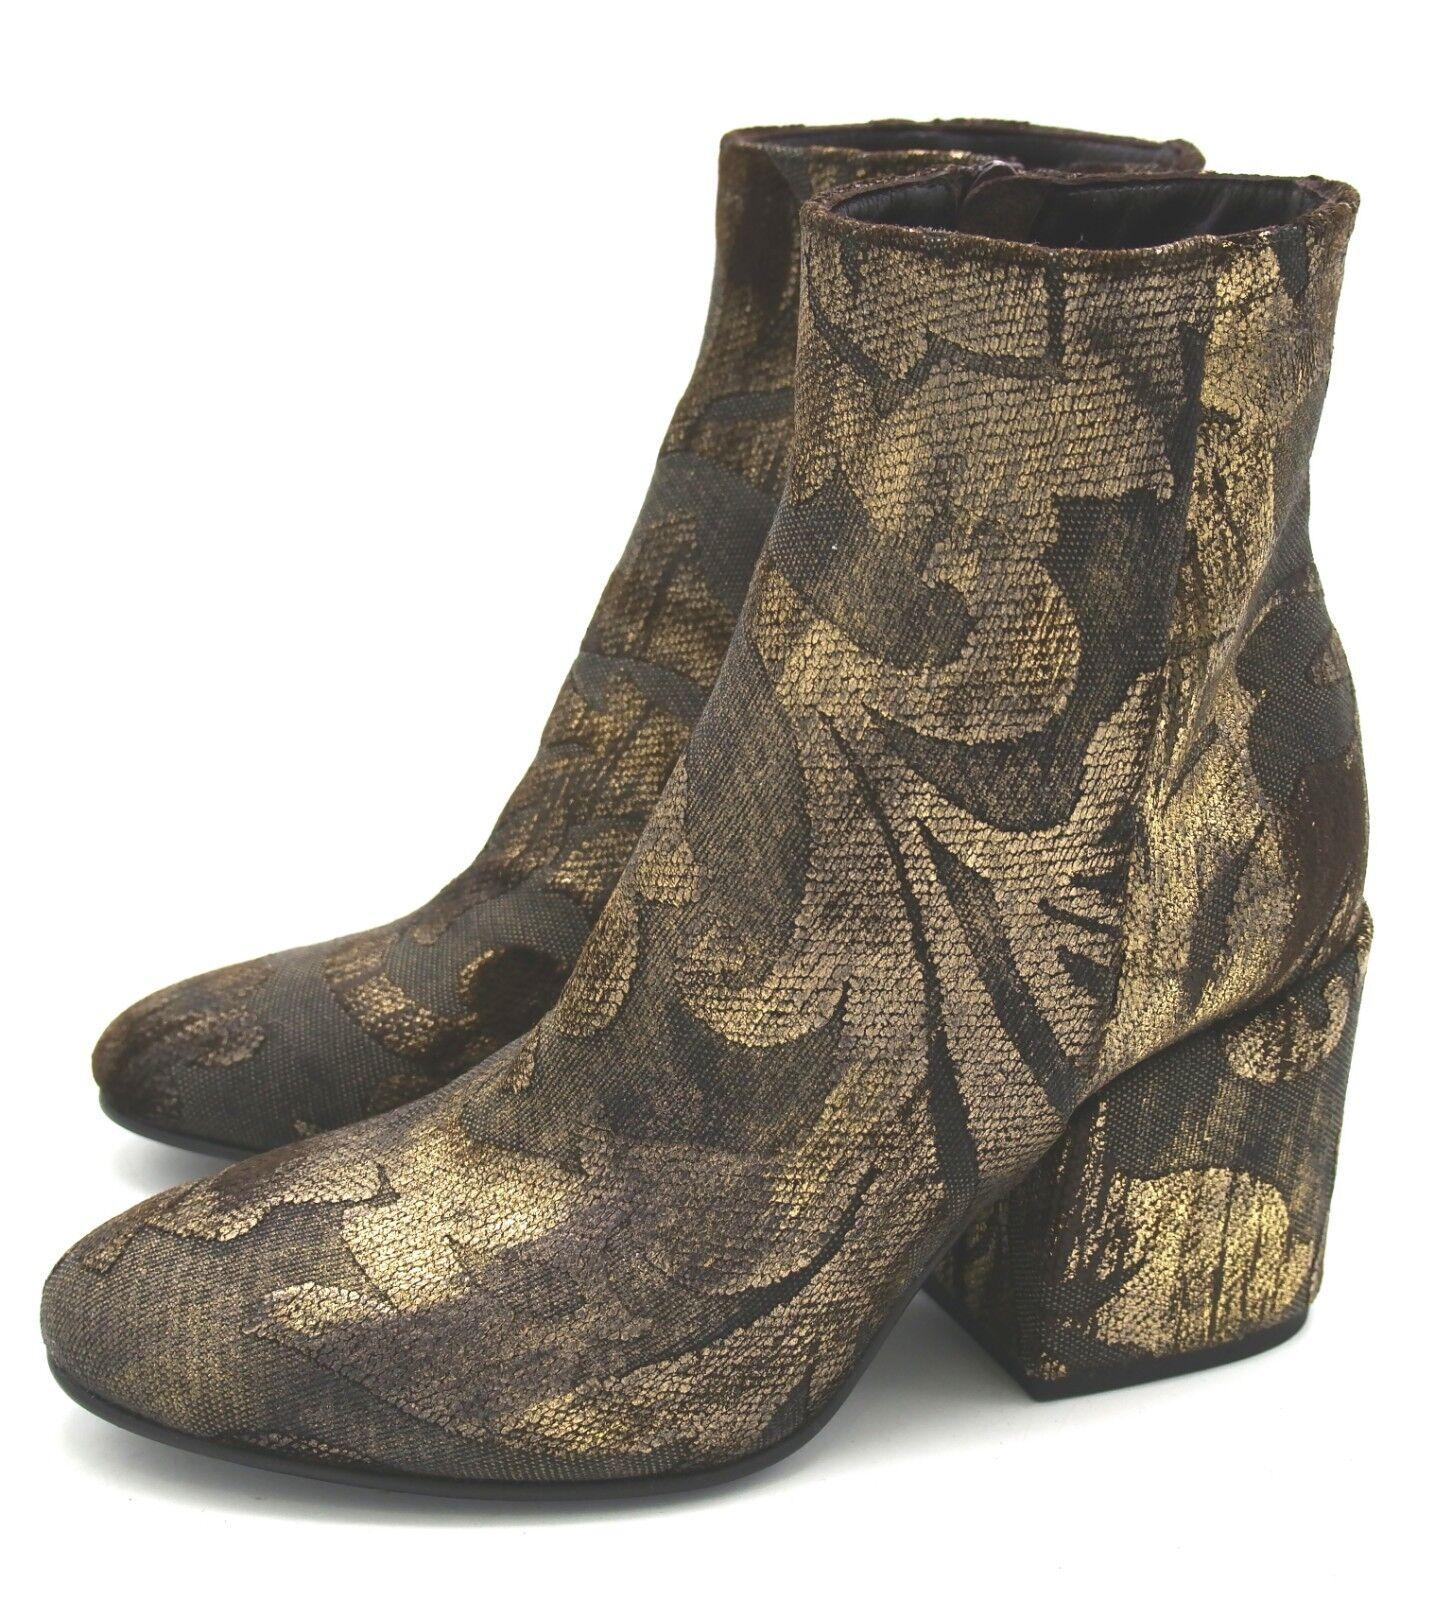 19d1e4b10b6 J6836 New Womens Womens Womens Vince Camuto Thalia Bronze Ankle ...